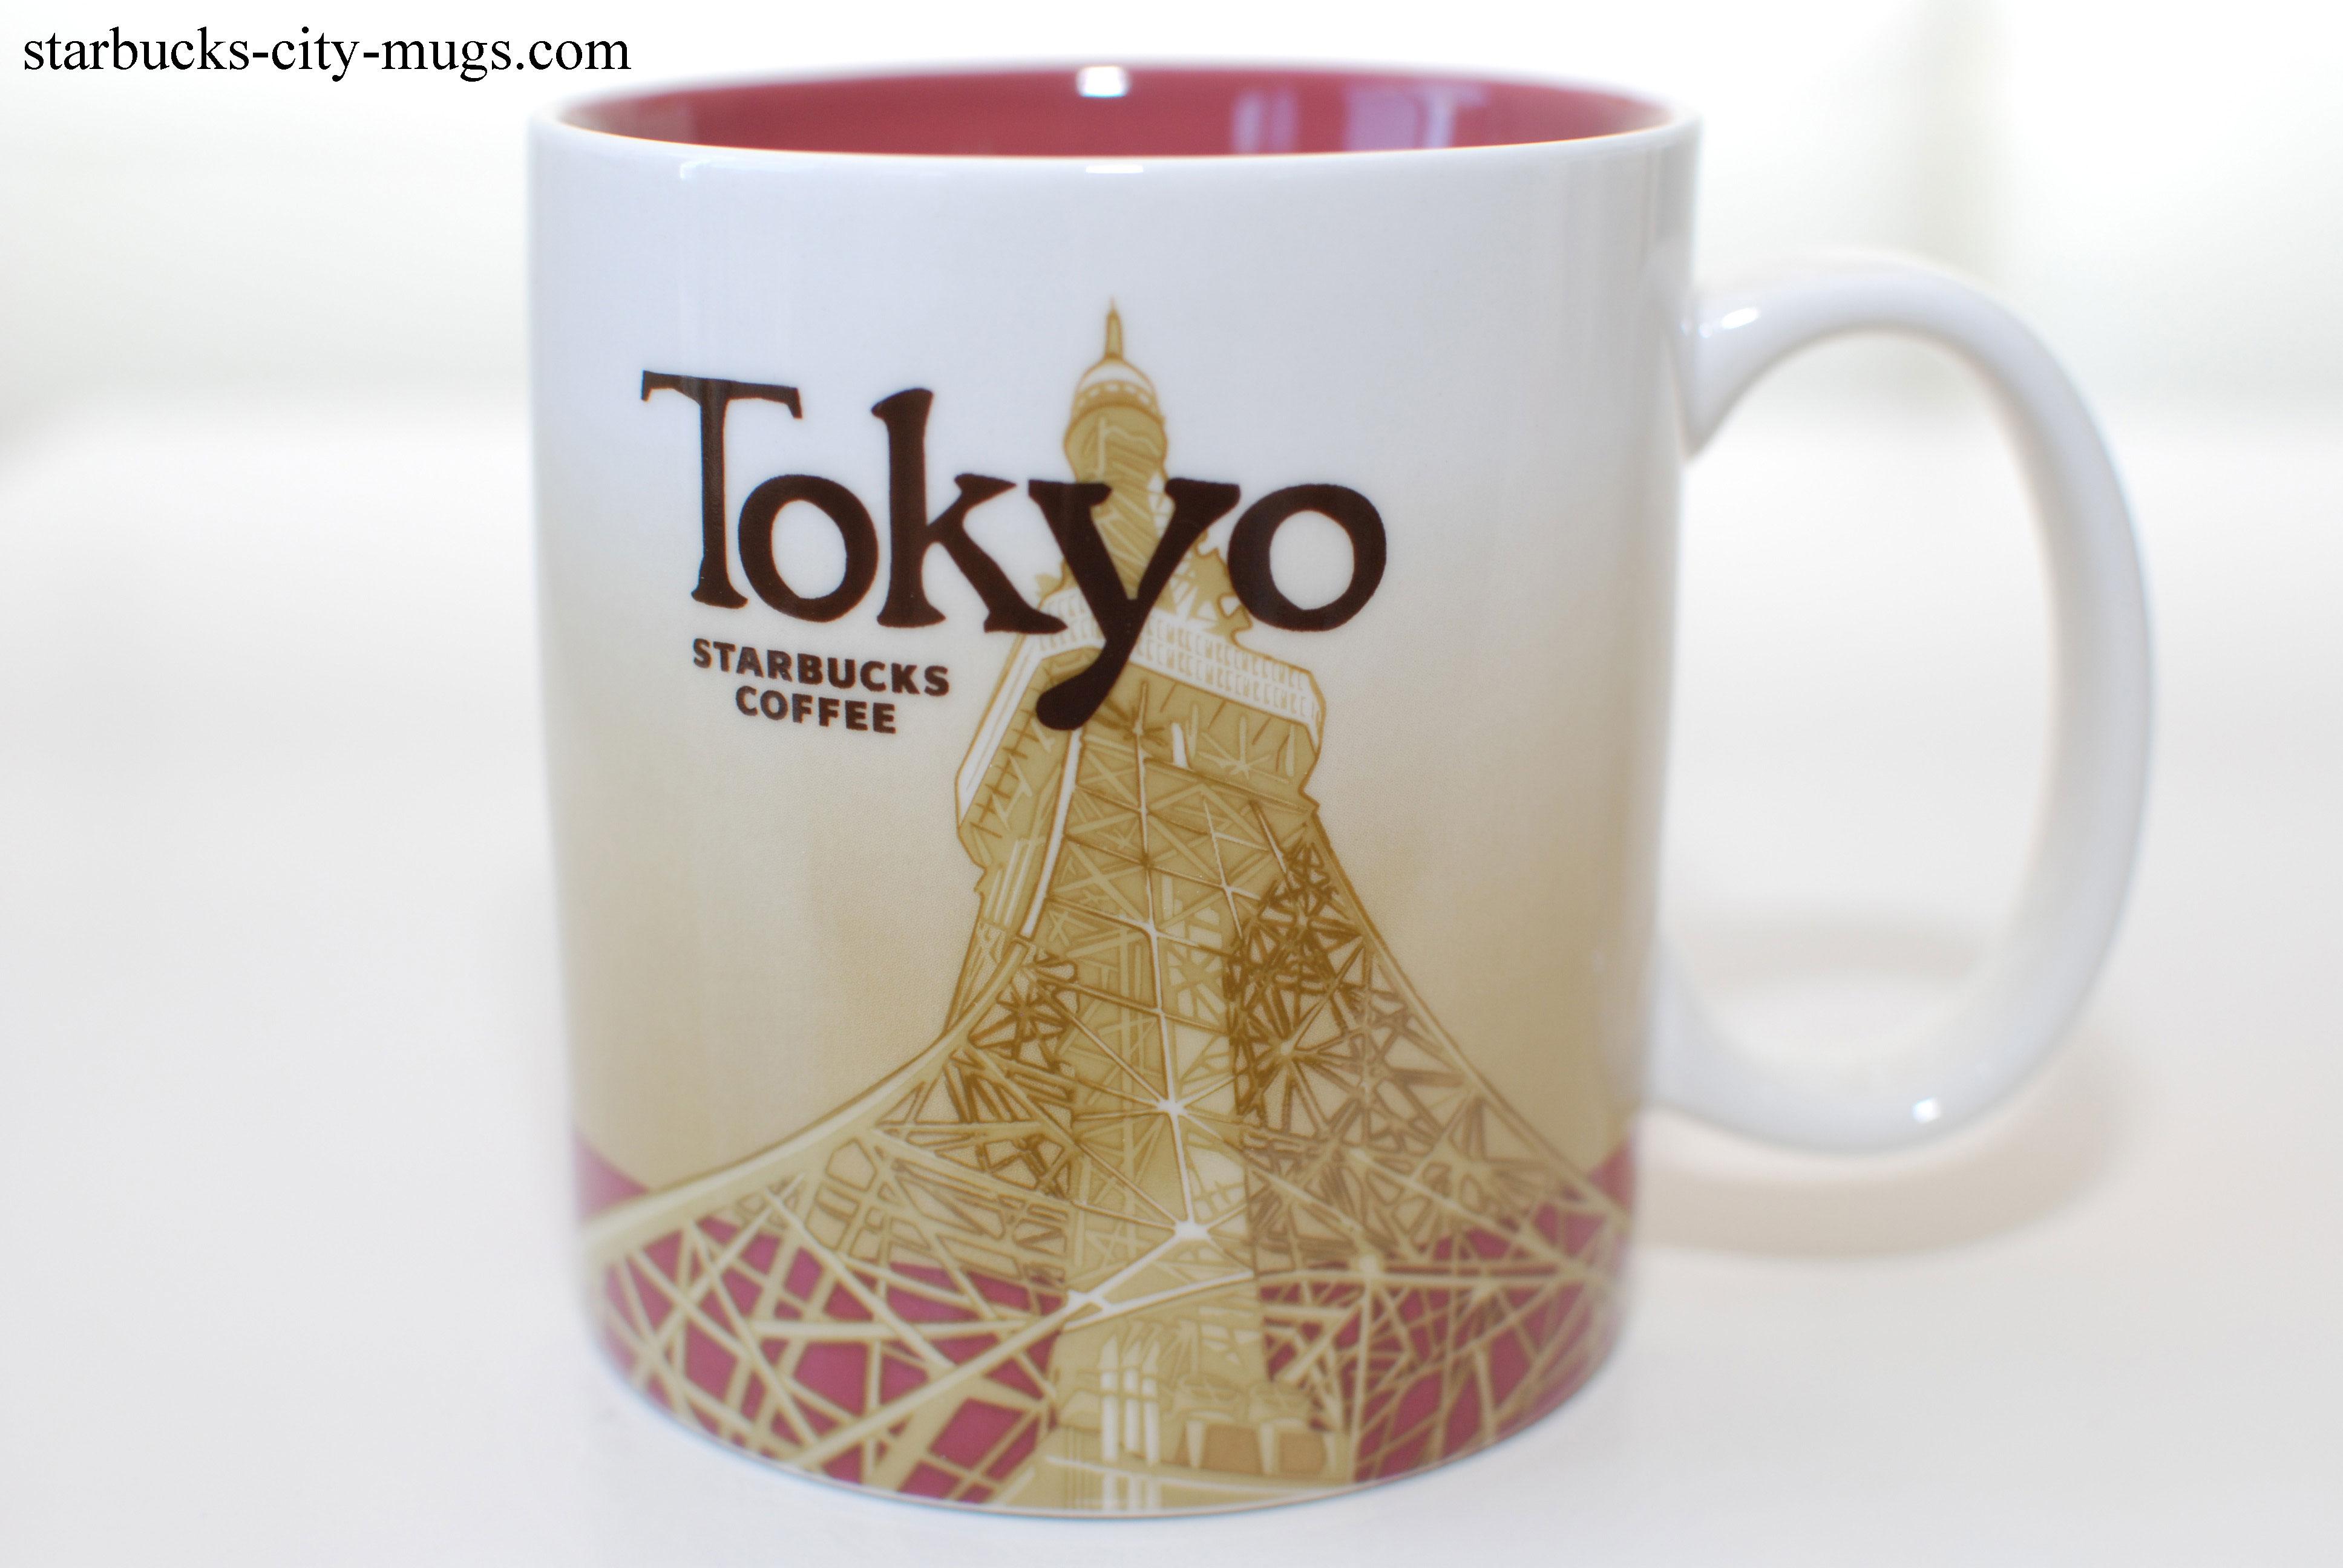 JAPAN ICONS | Starbucks City Mugs